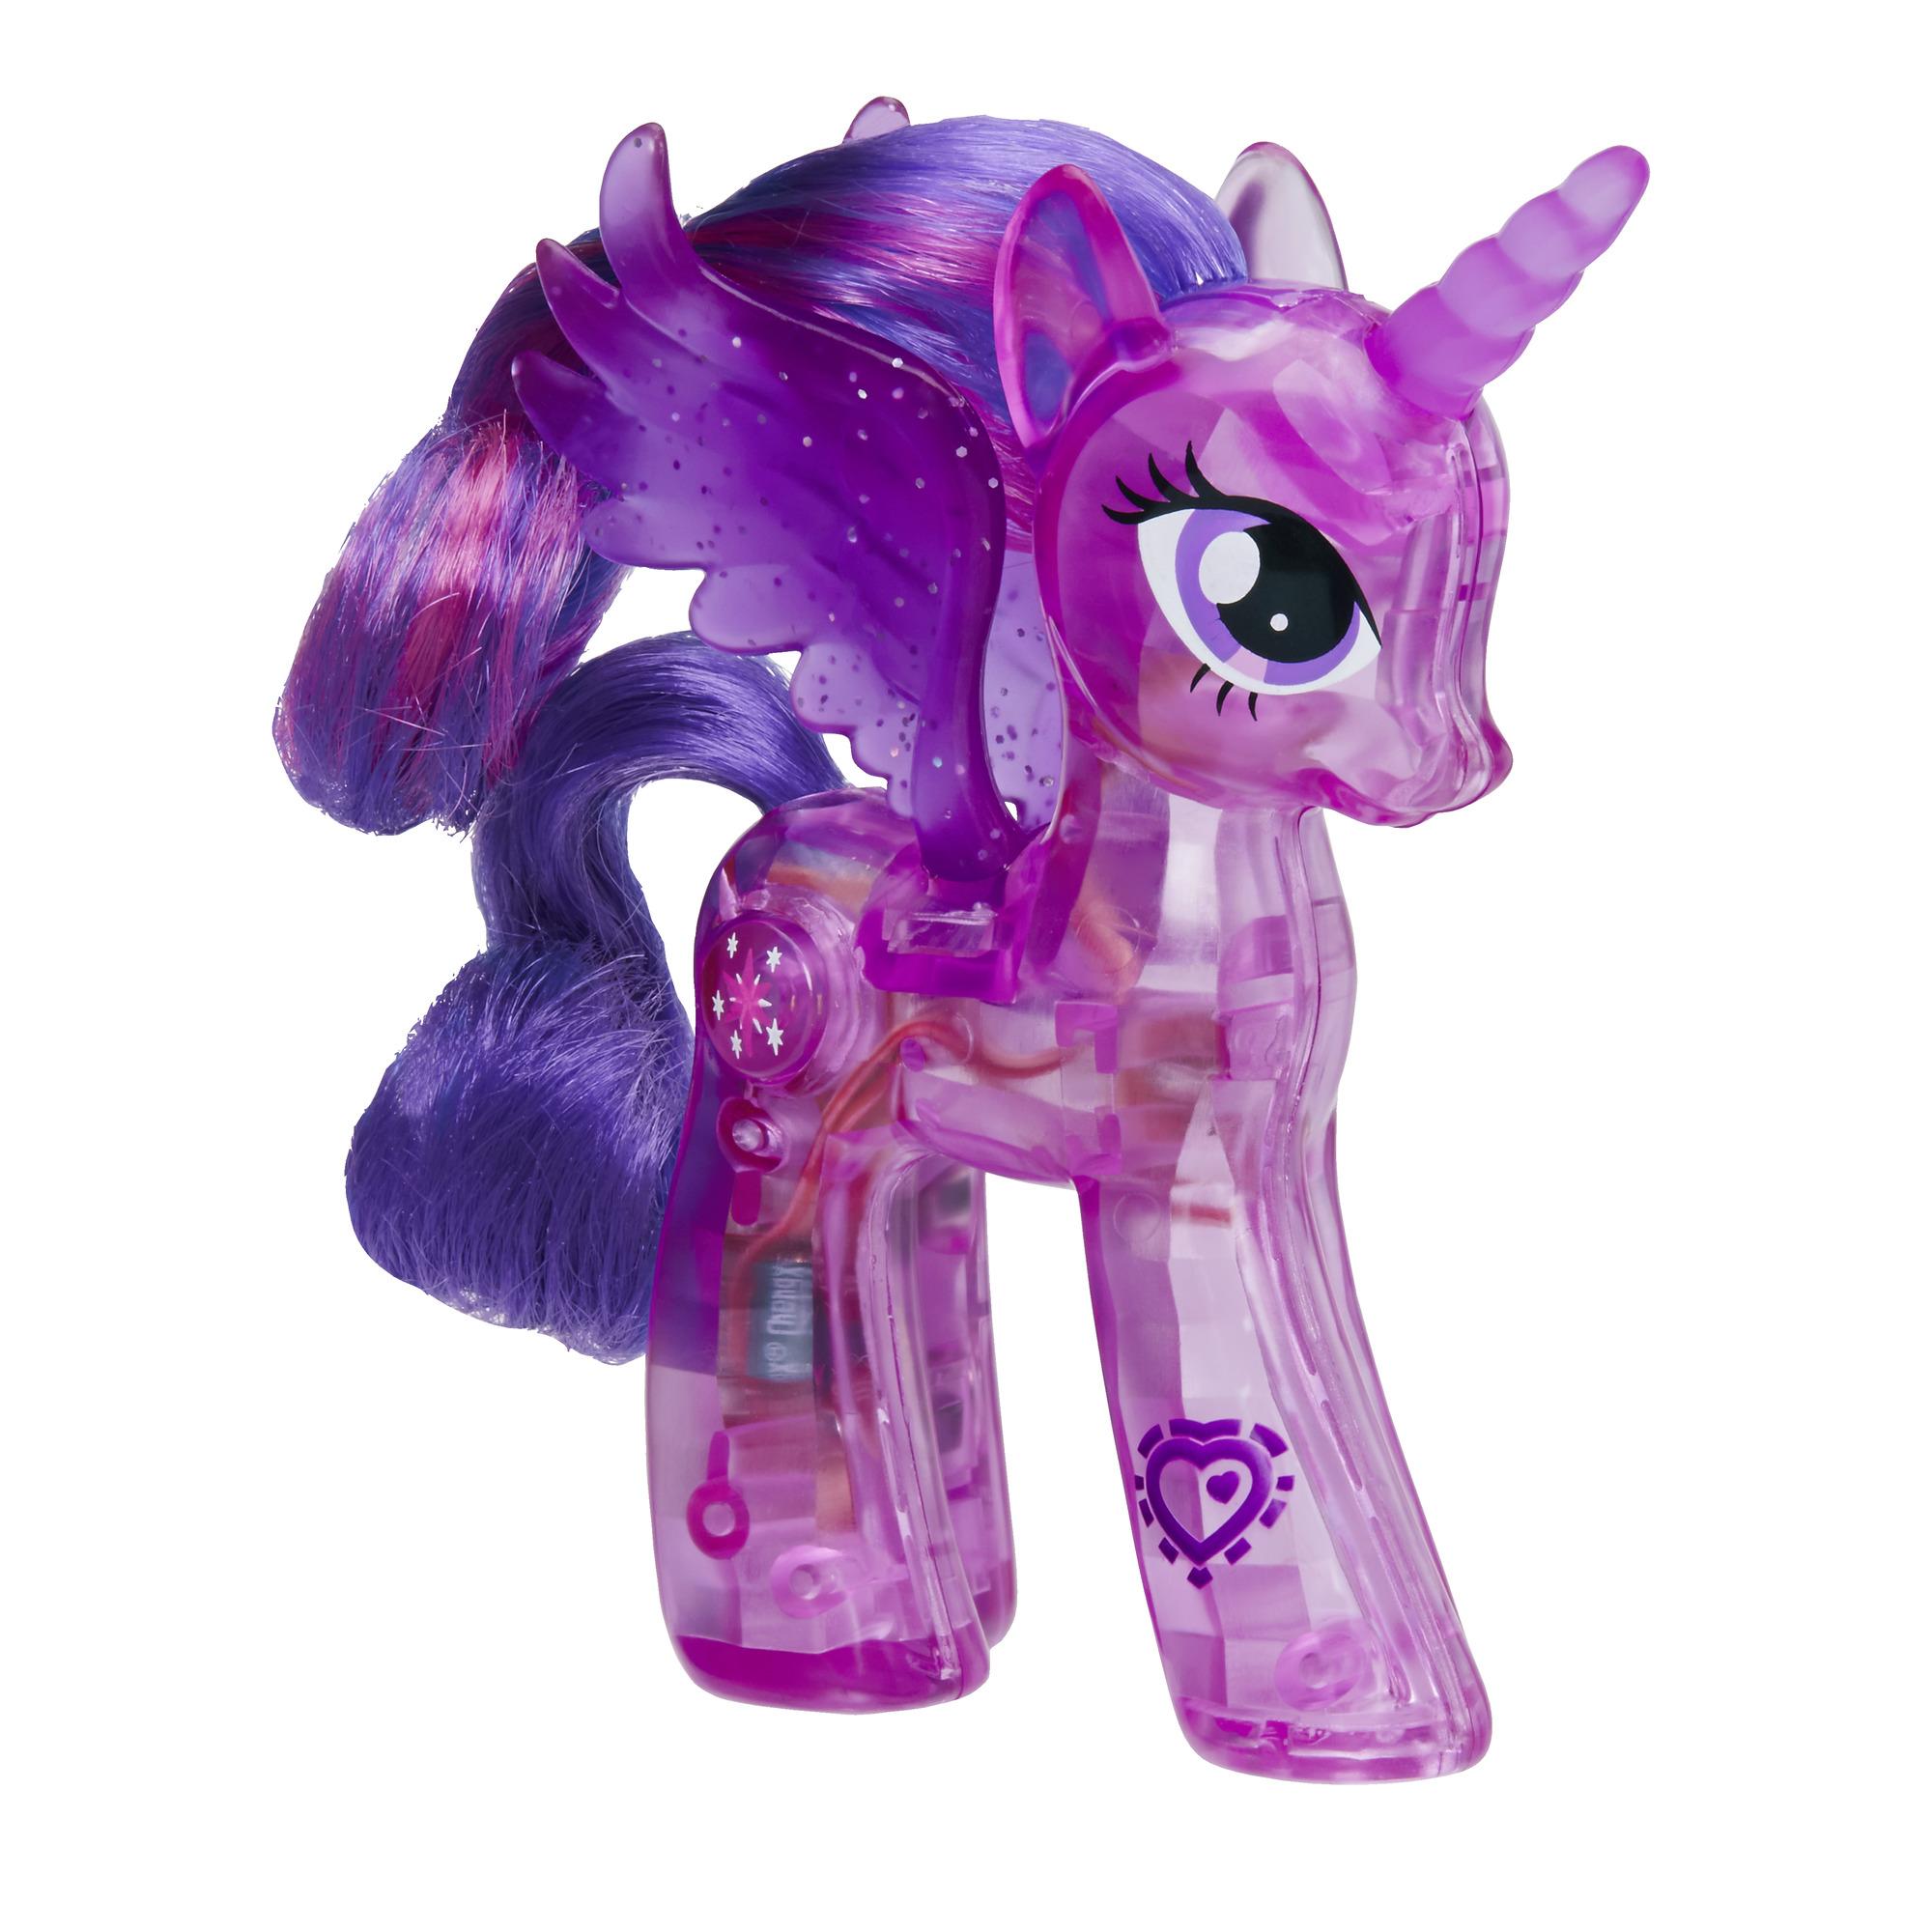 Little Pony Explore Equestria Sparkle Bright Princess Twilight